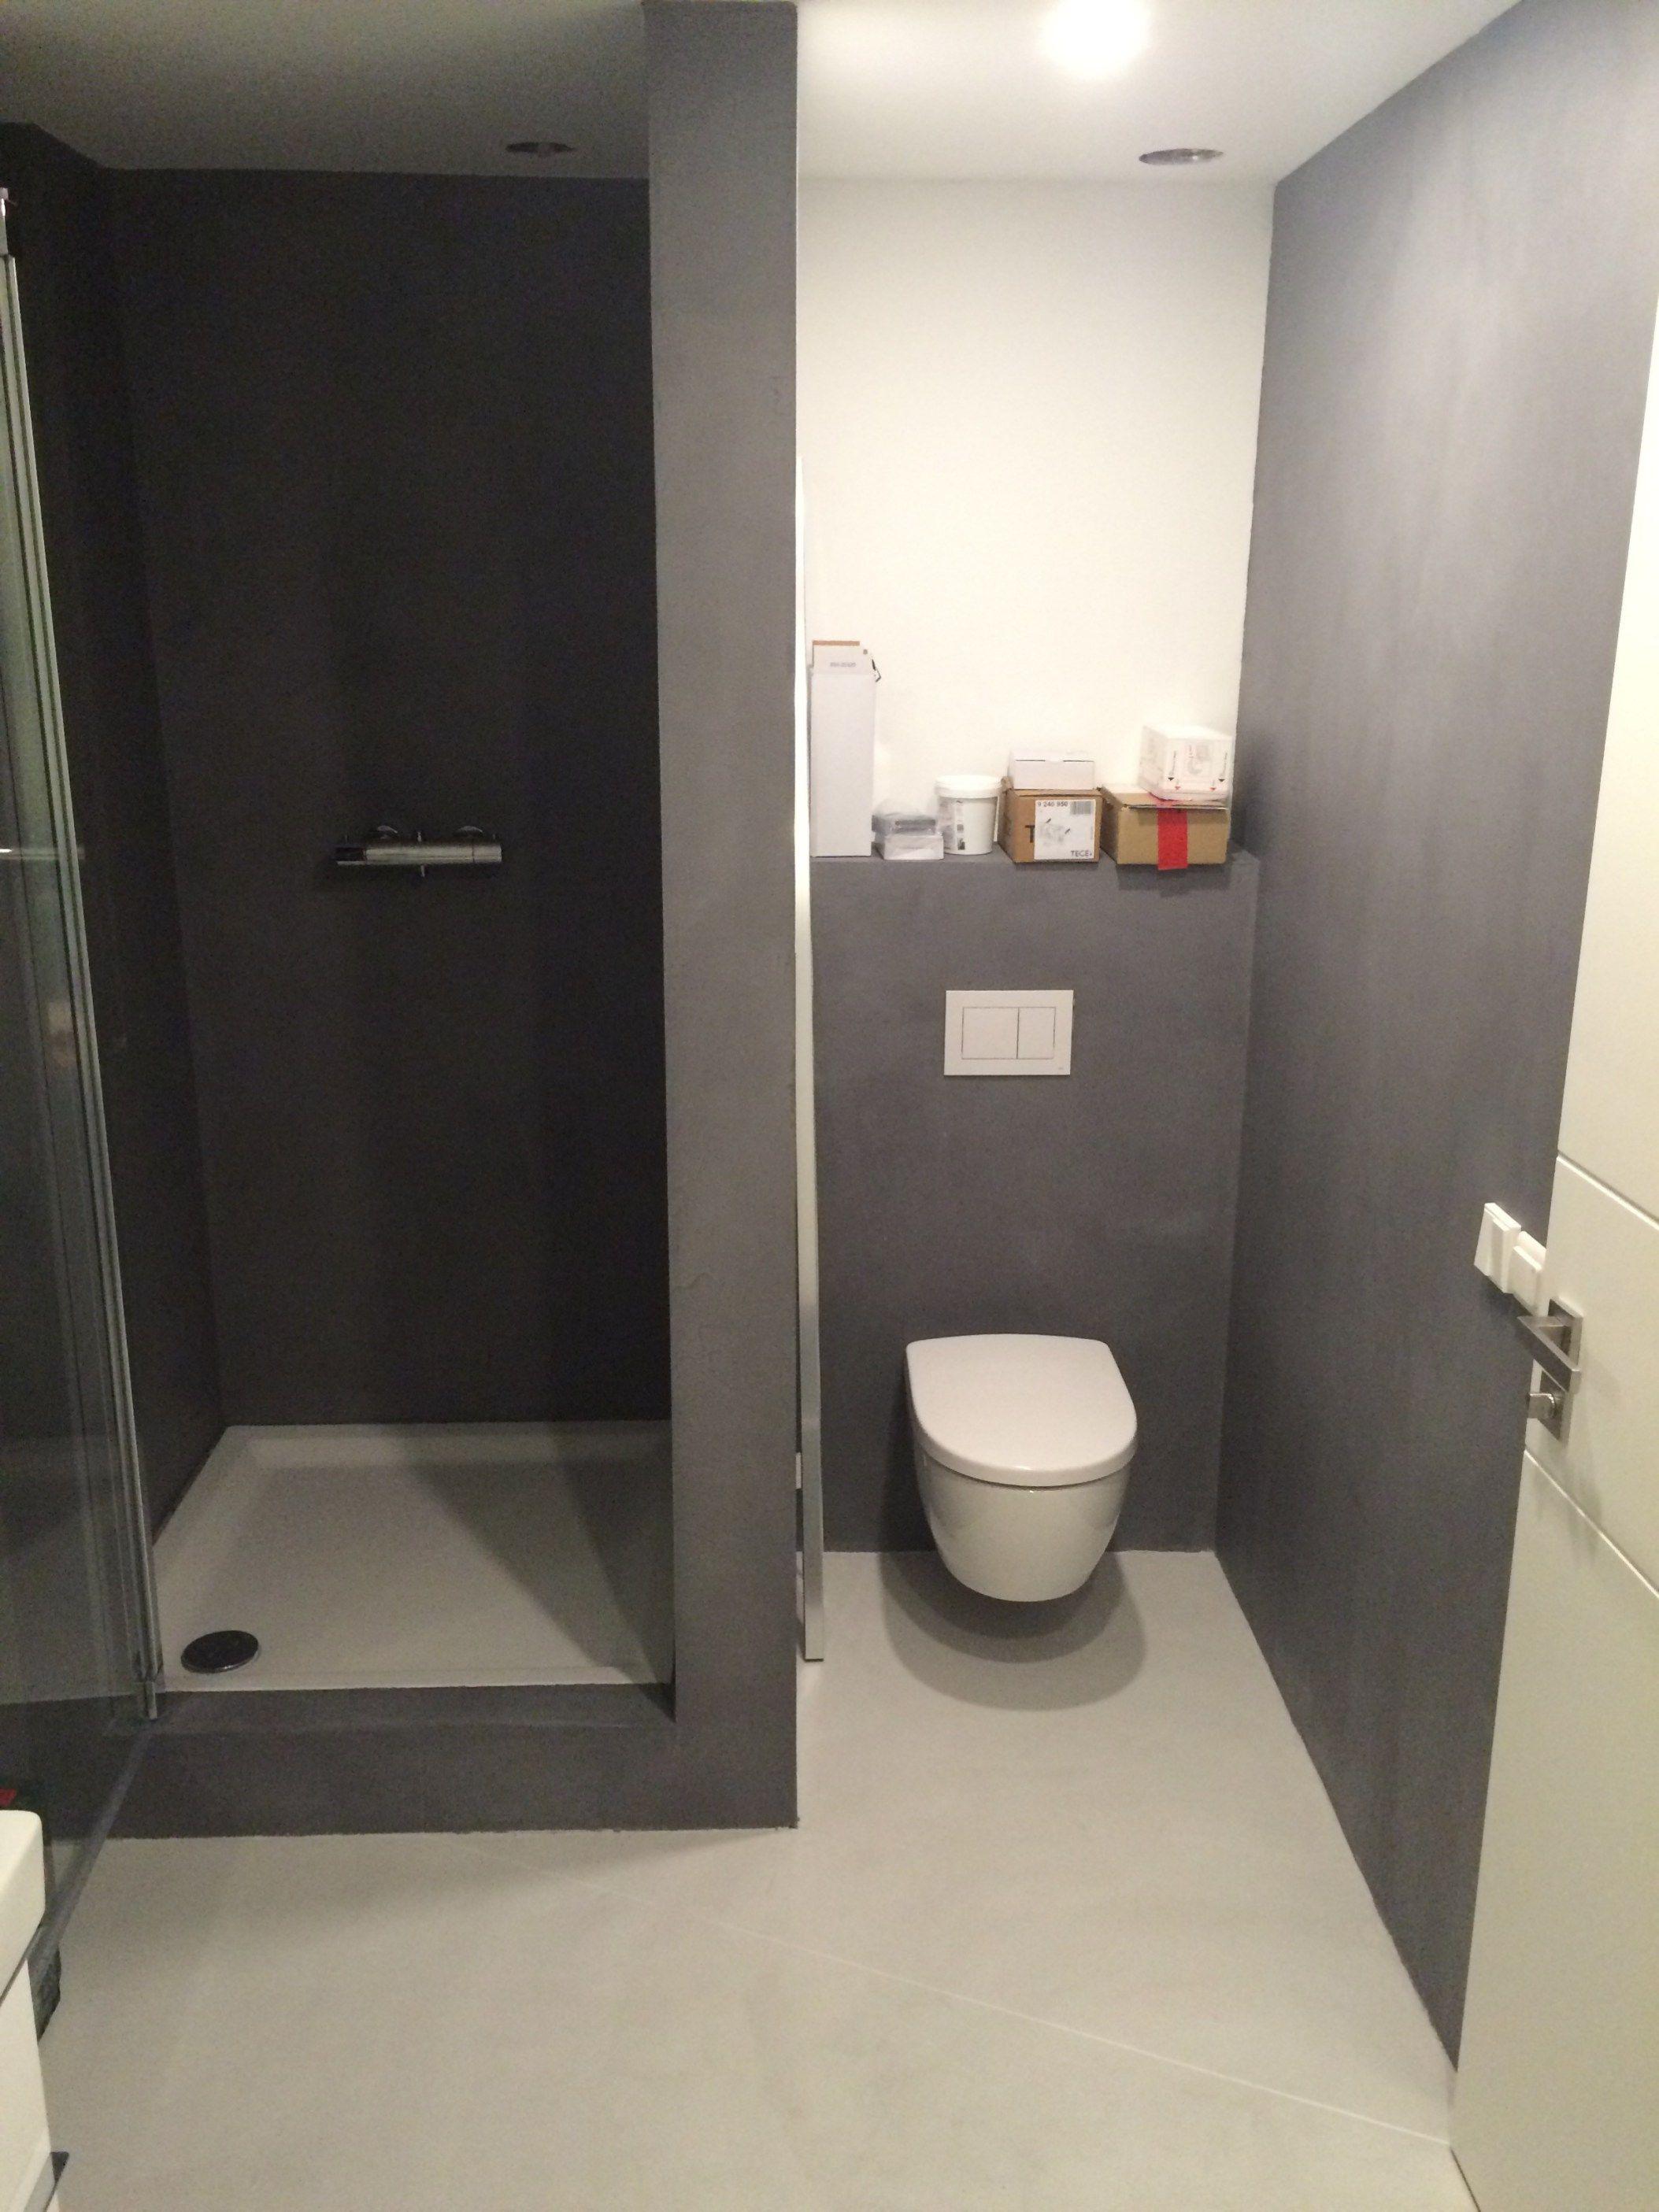 Beton Ciré douche en toilet Delft - Badkamerontwerp   Pinterest ...